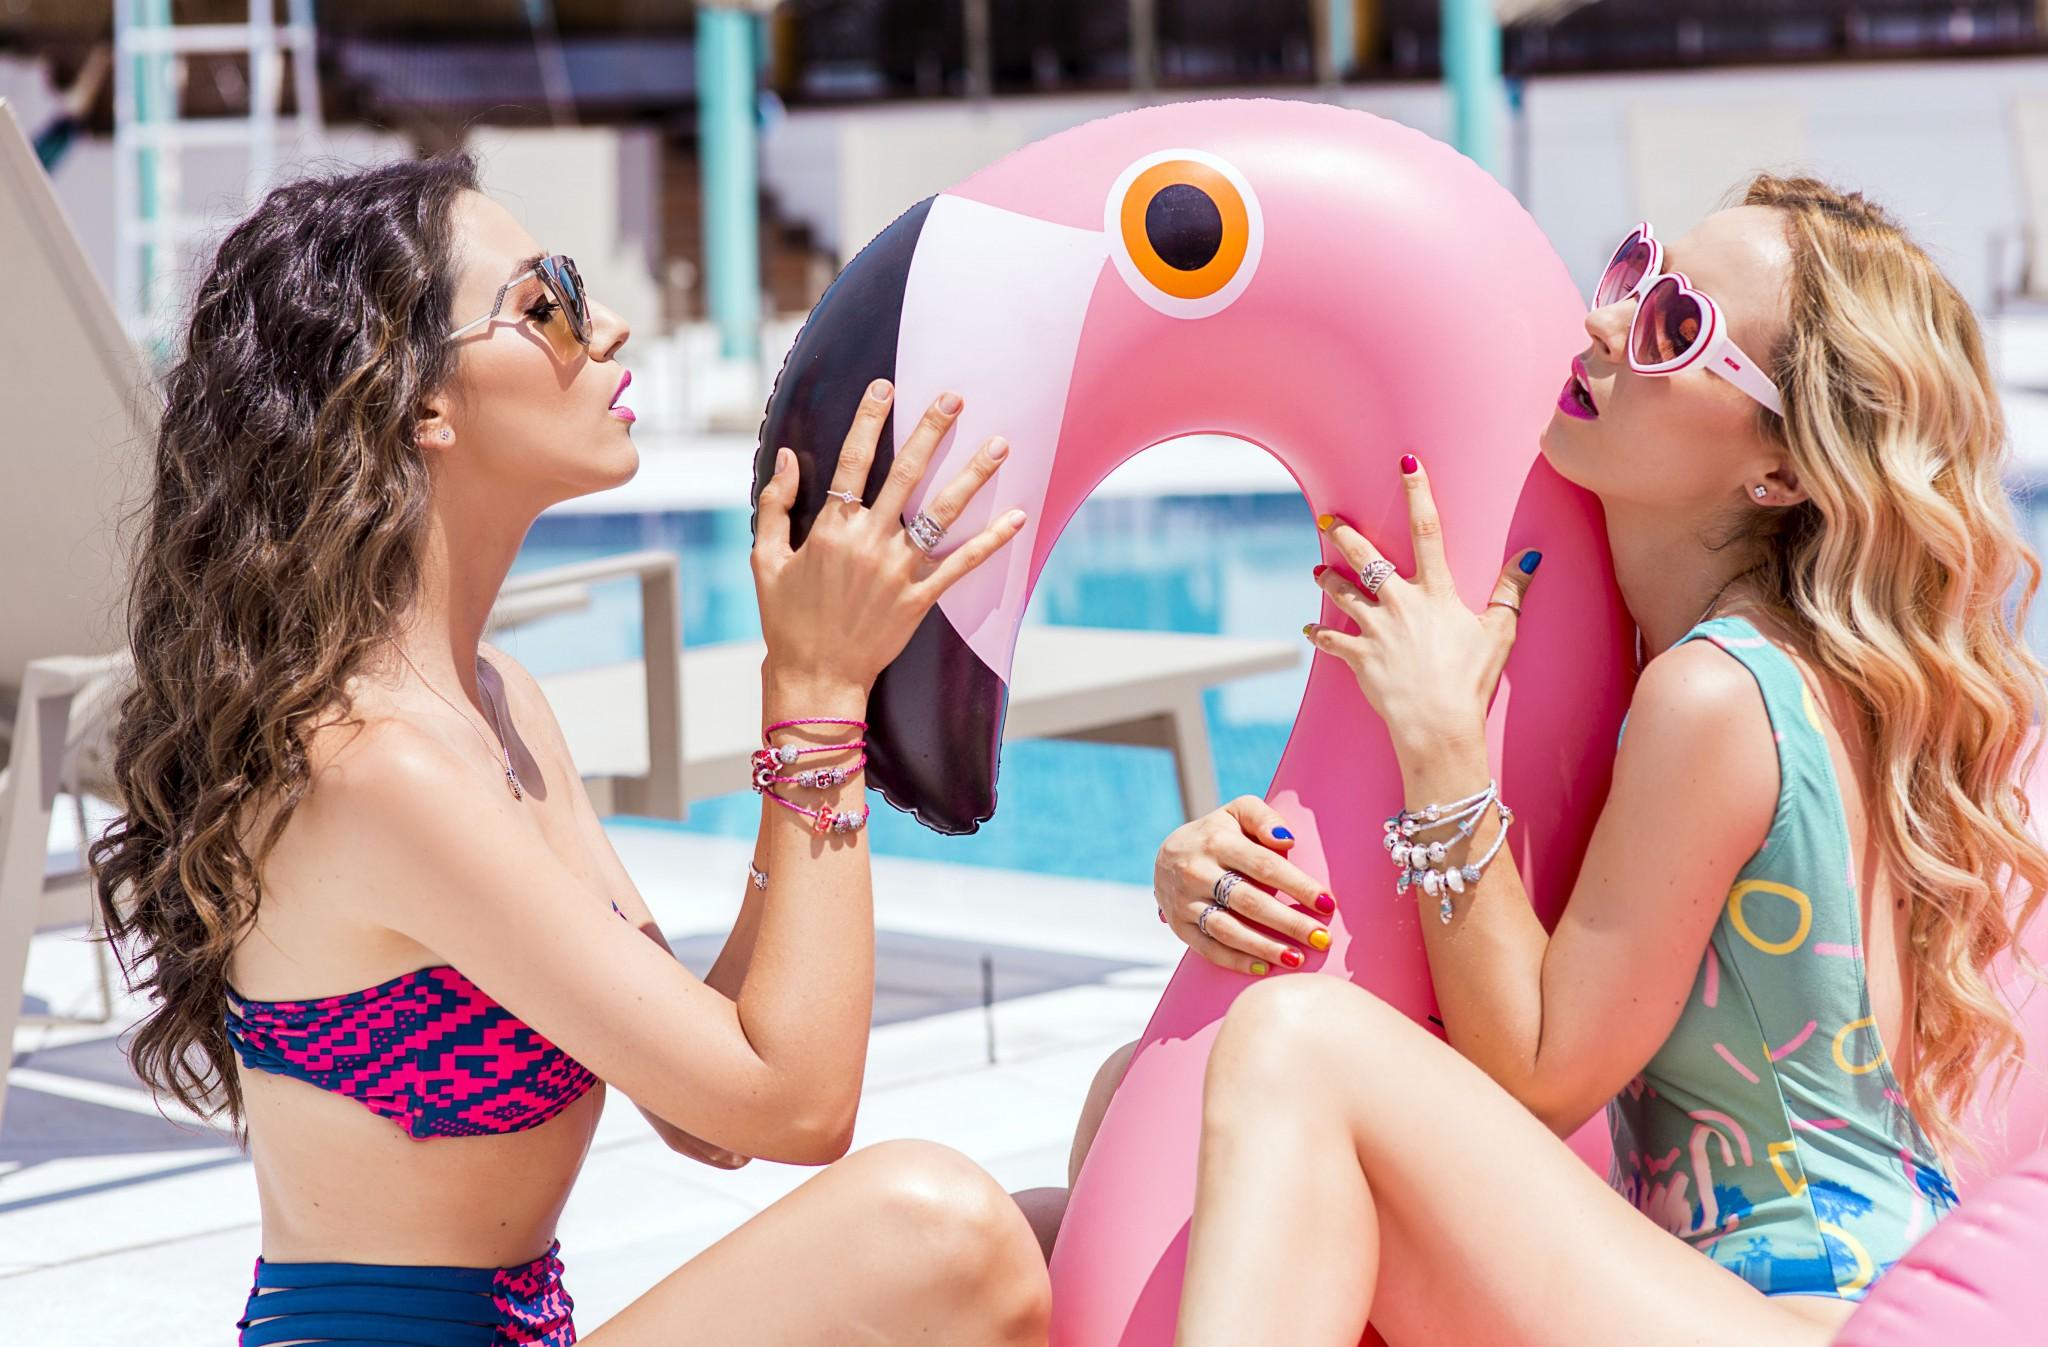 2fabulous_muses_pandora_summer2016_collection_youniverse_piscina